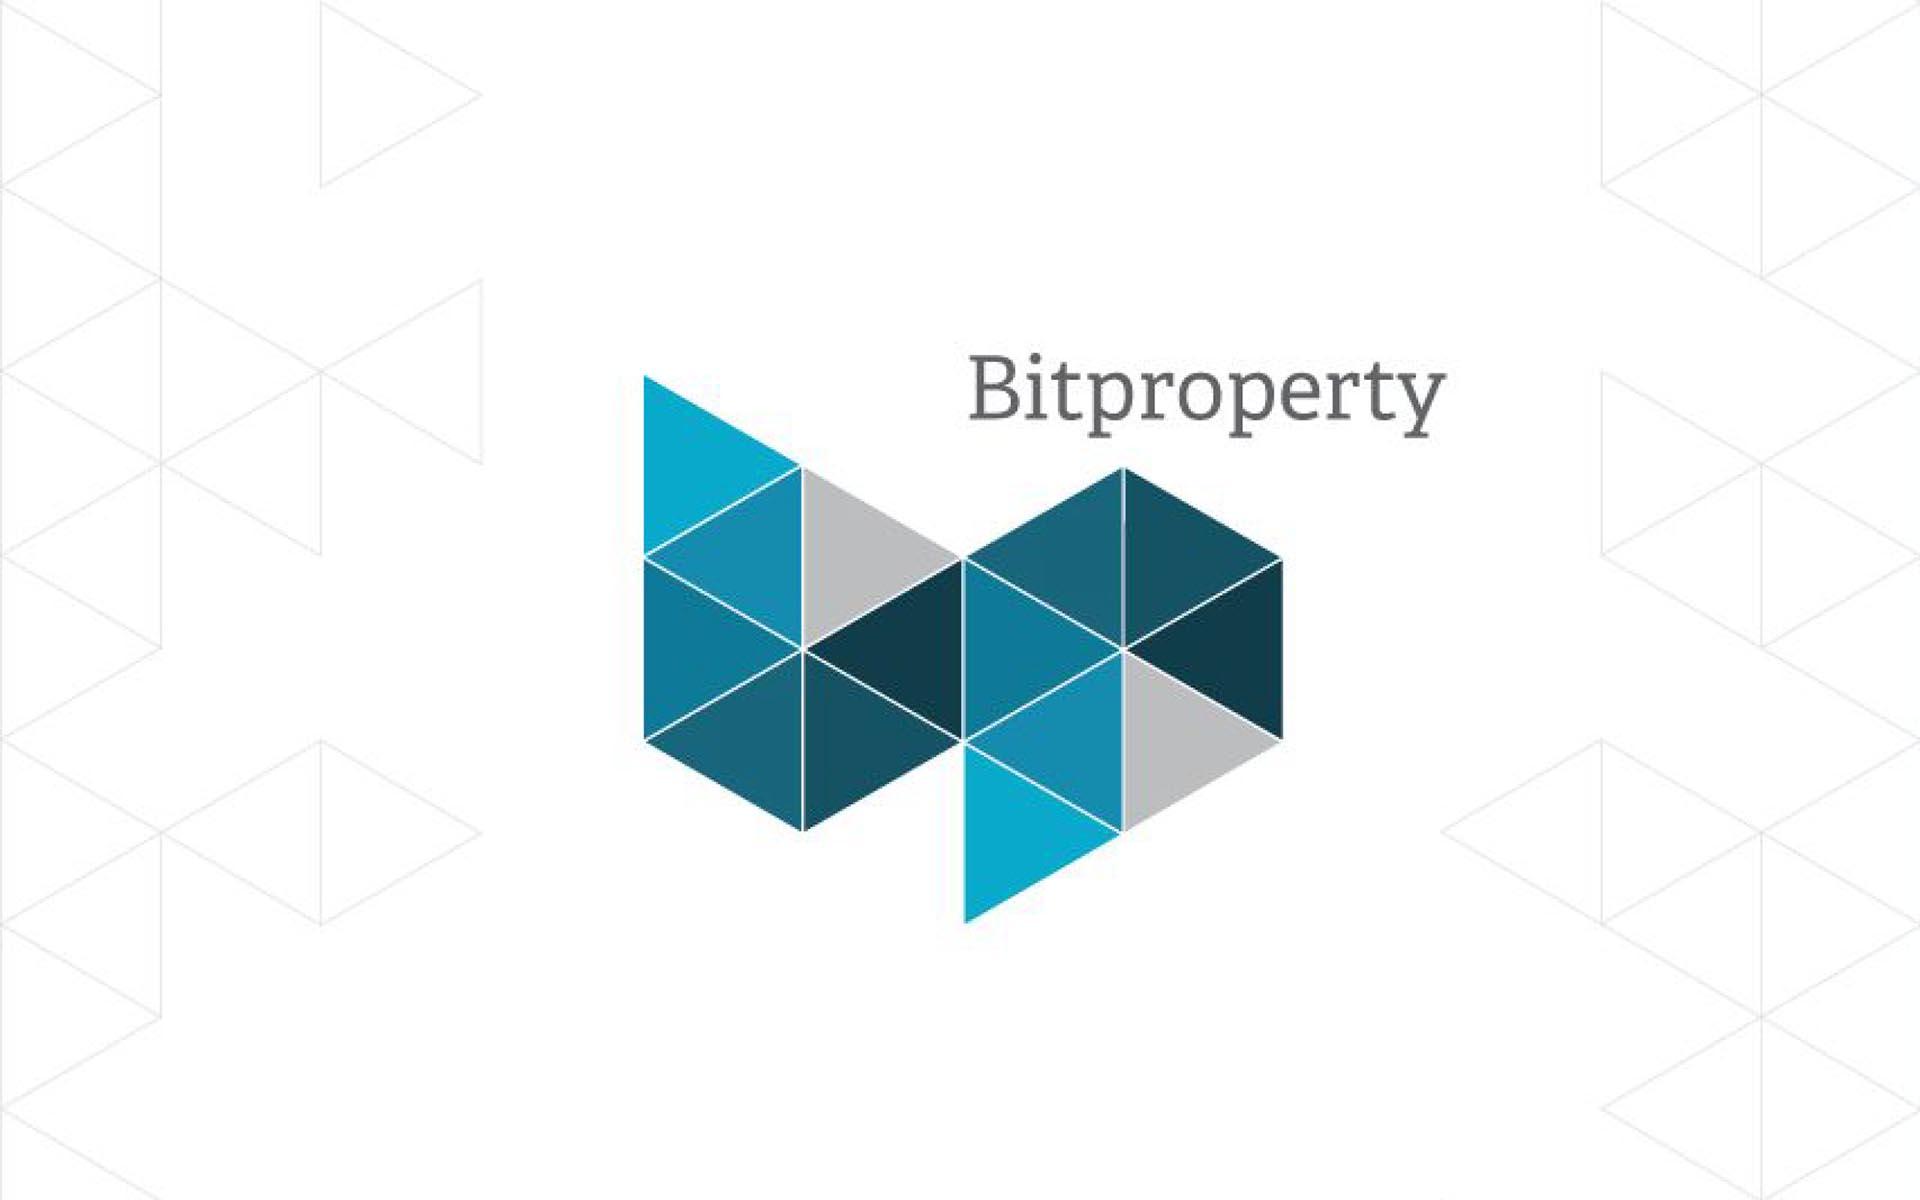 BitProperty Announces Upcoming Token Sale, Beta Release of Real Estate Investment Platform